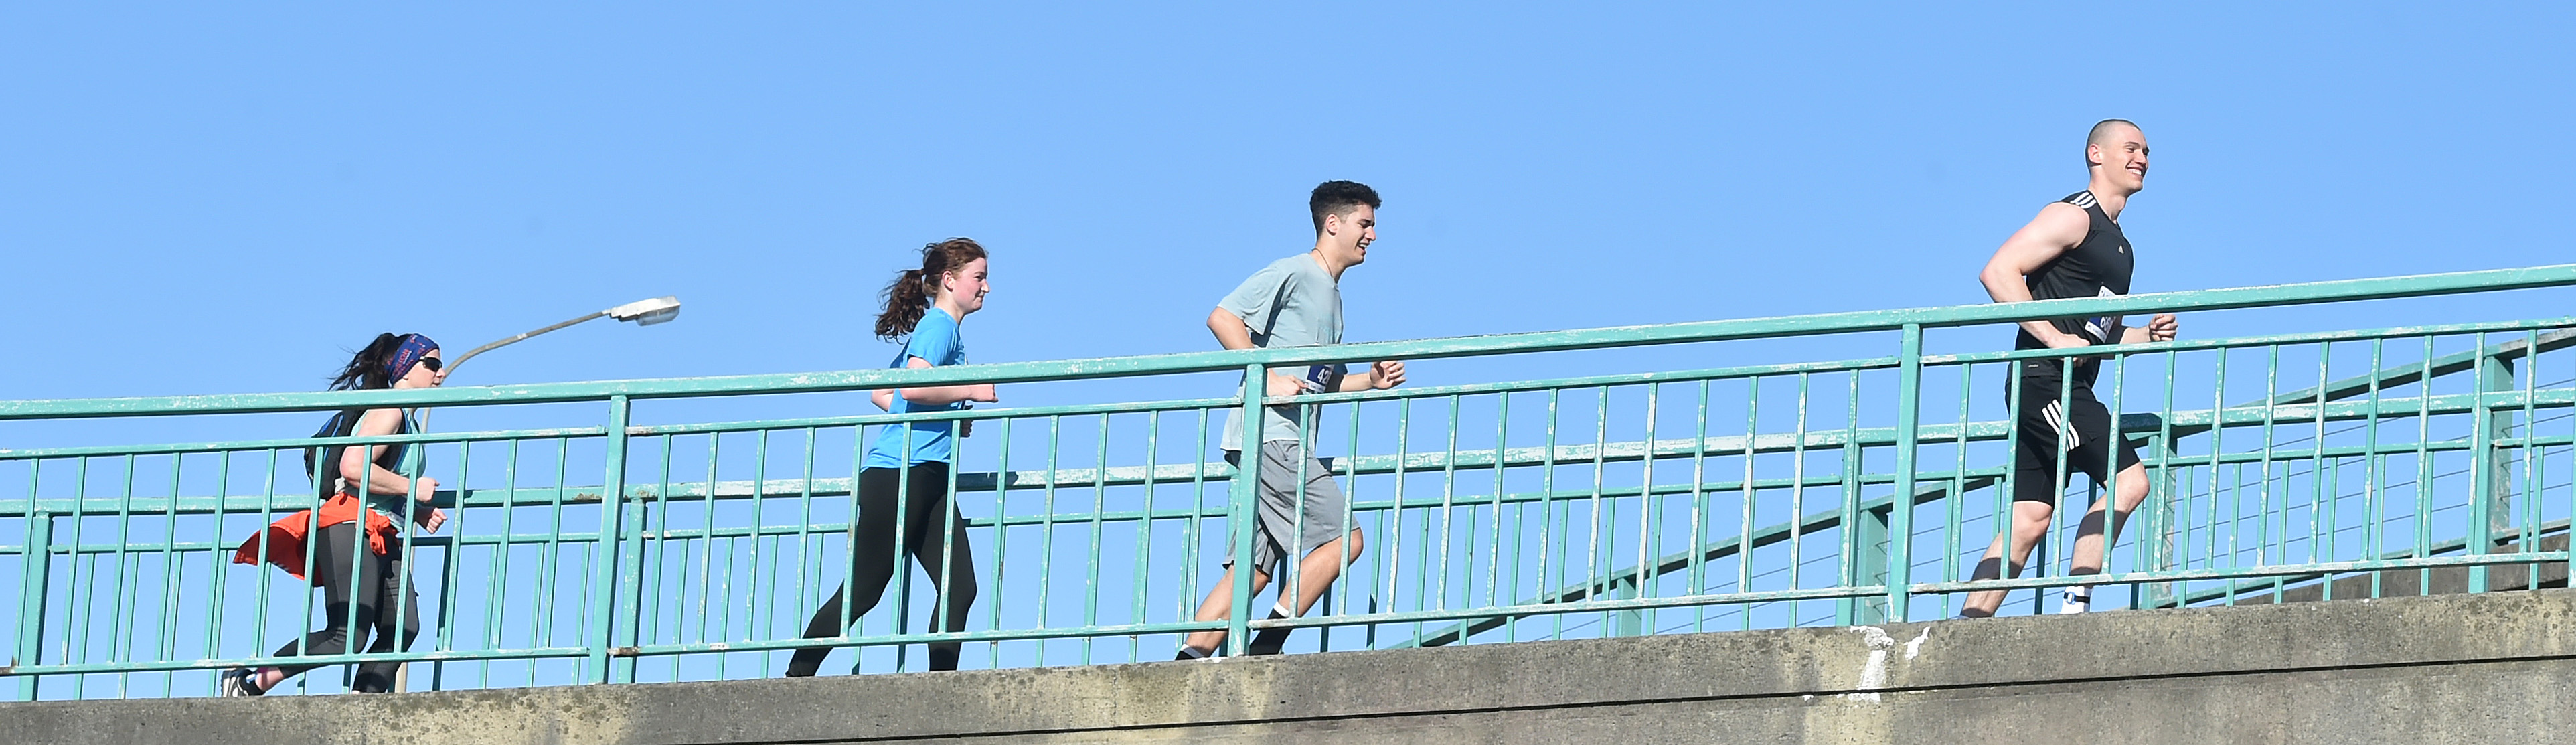 Runners enjoy fine conditions in yesterday's marathon. Photos: Gregor Richardson